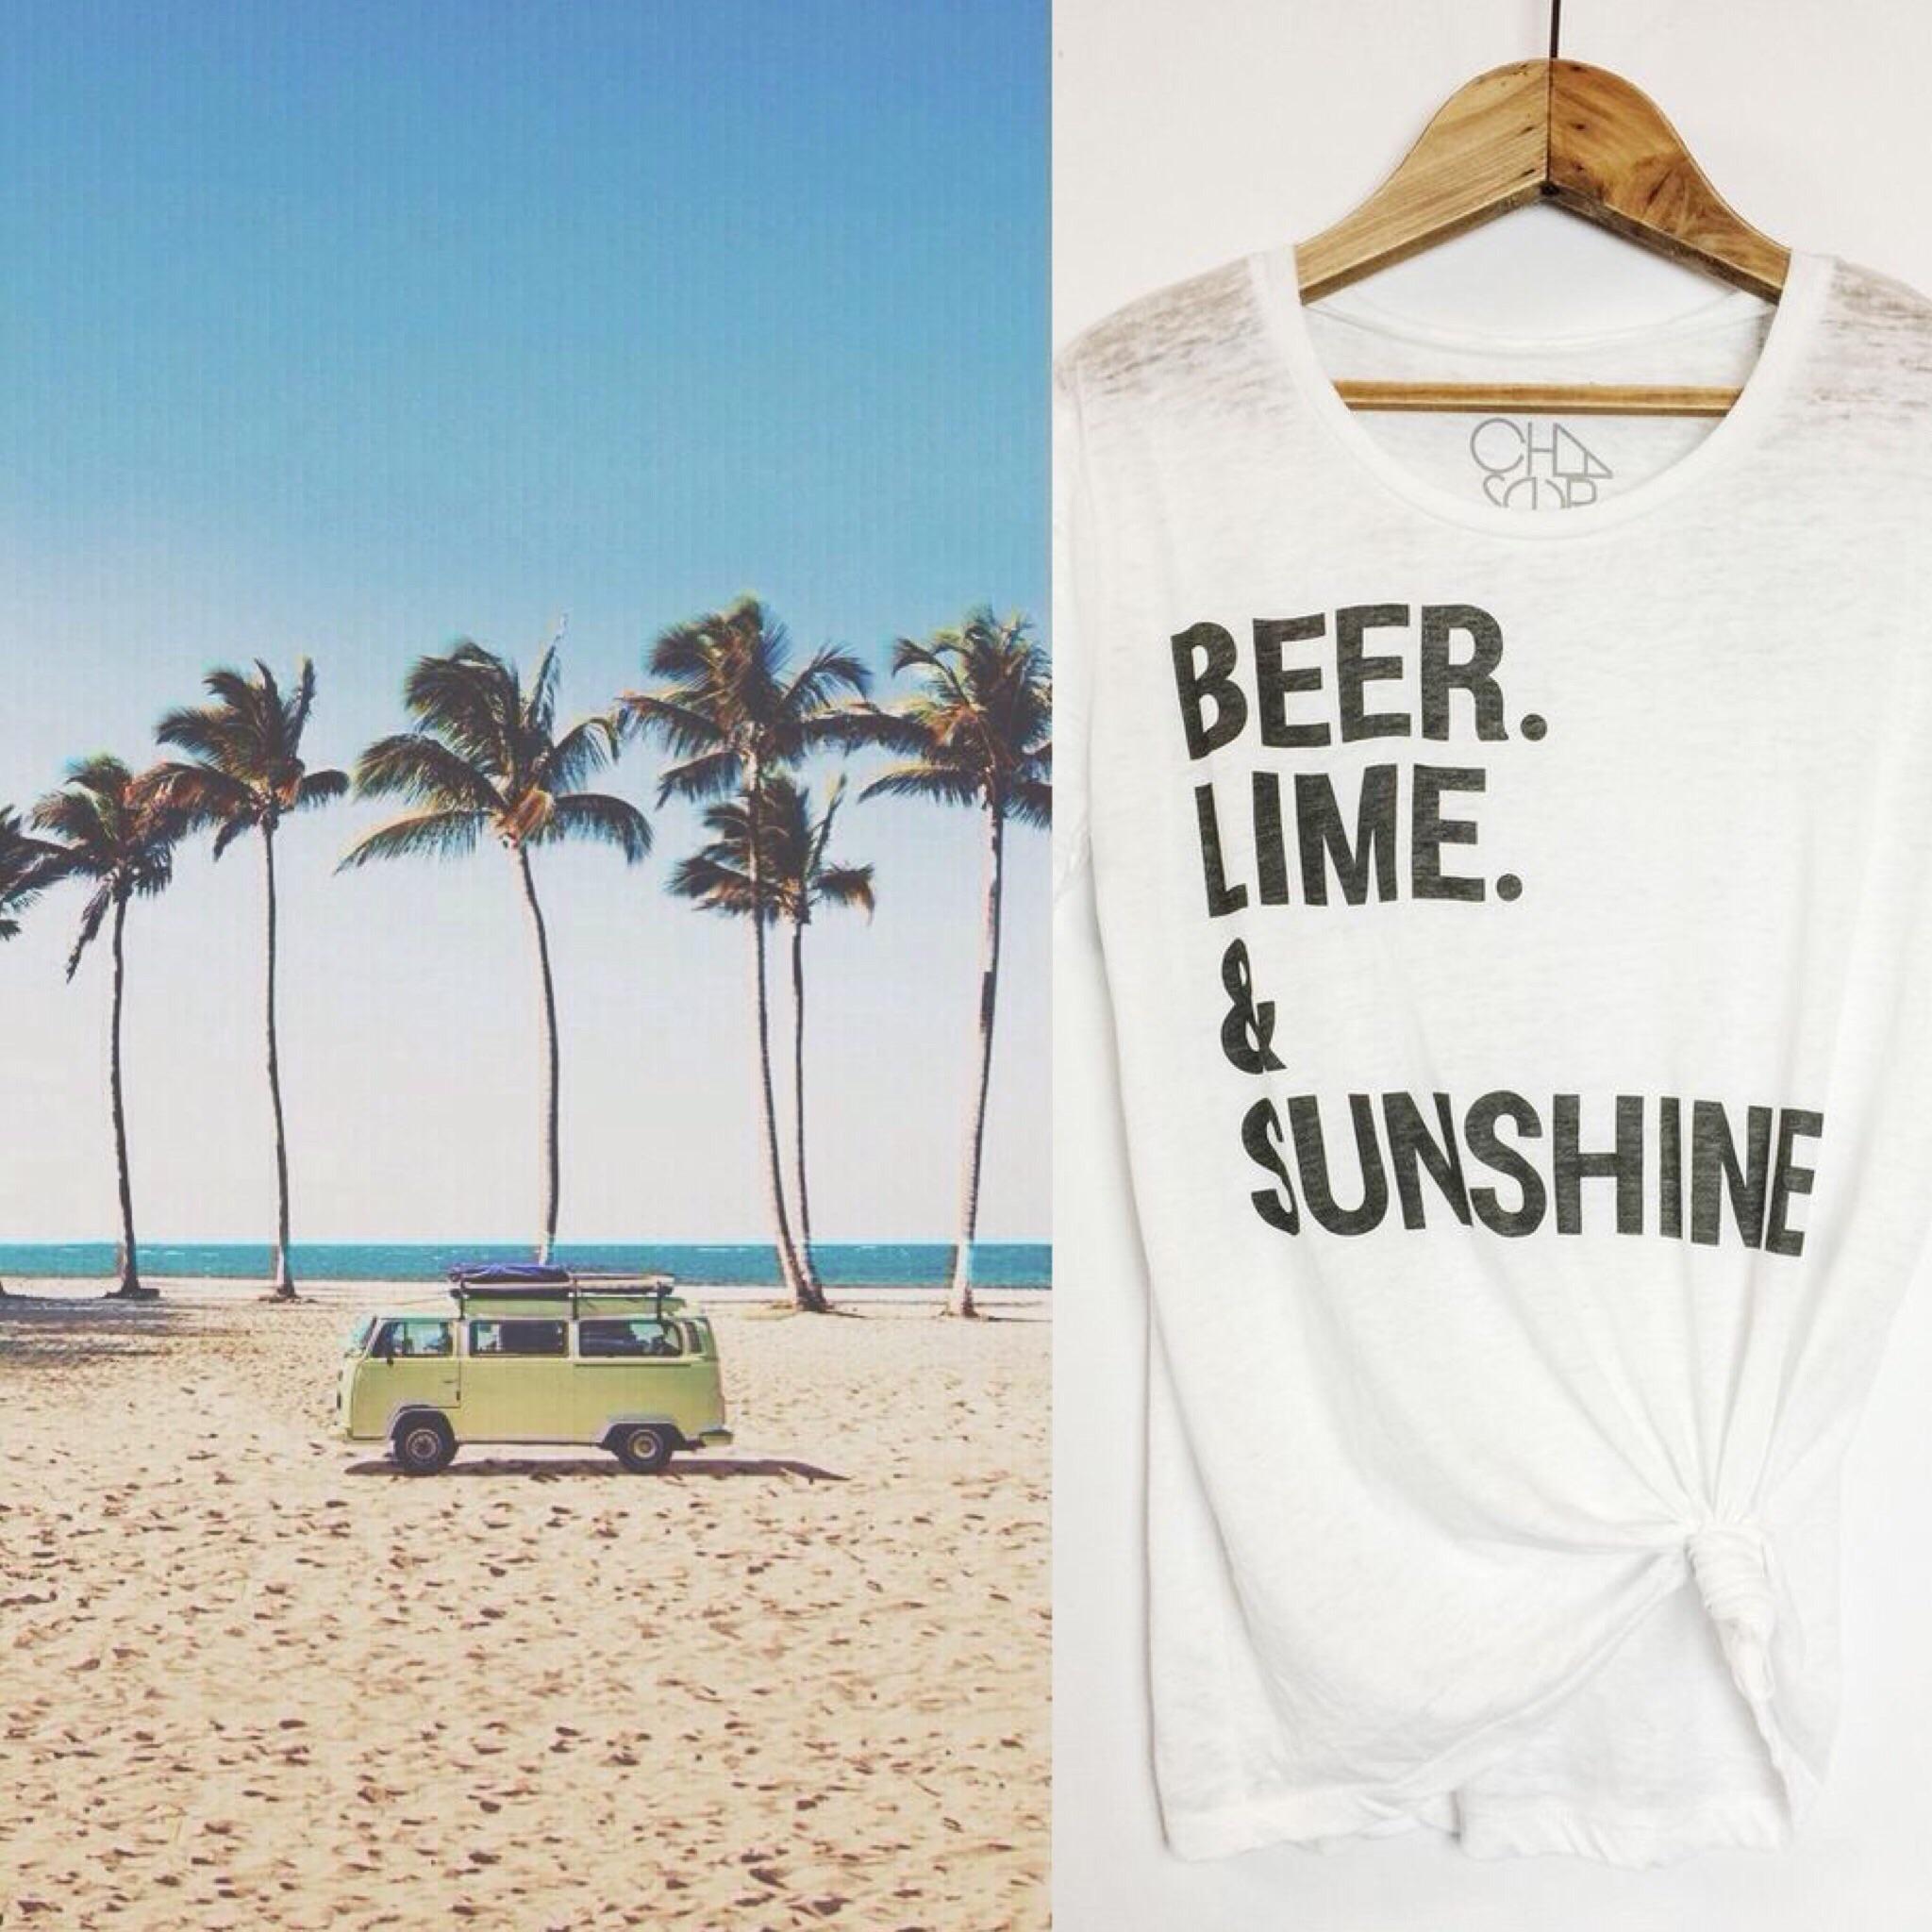 L-R:  VW & Palms ,  Beer Lime & Sunshine Shirt